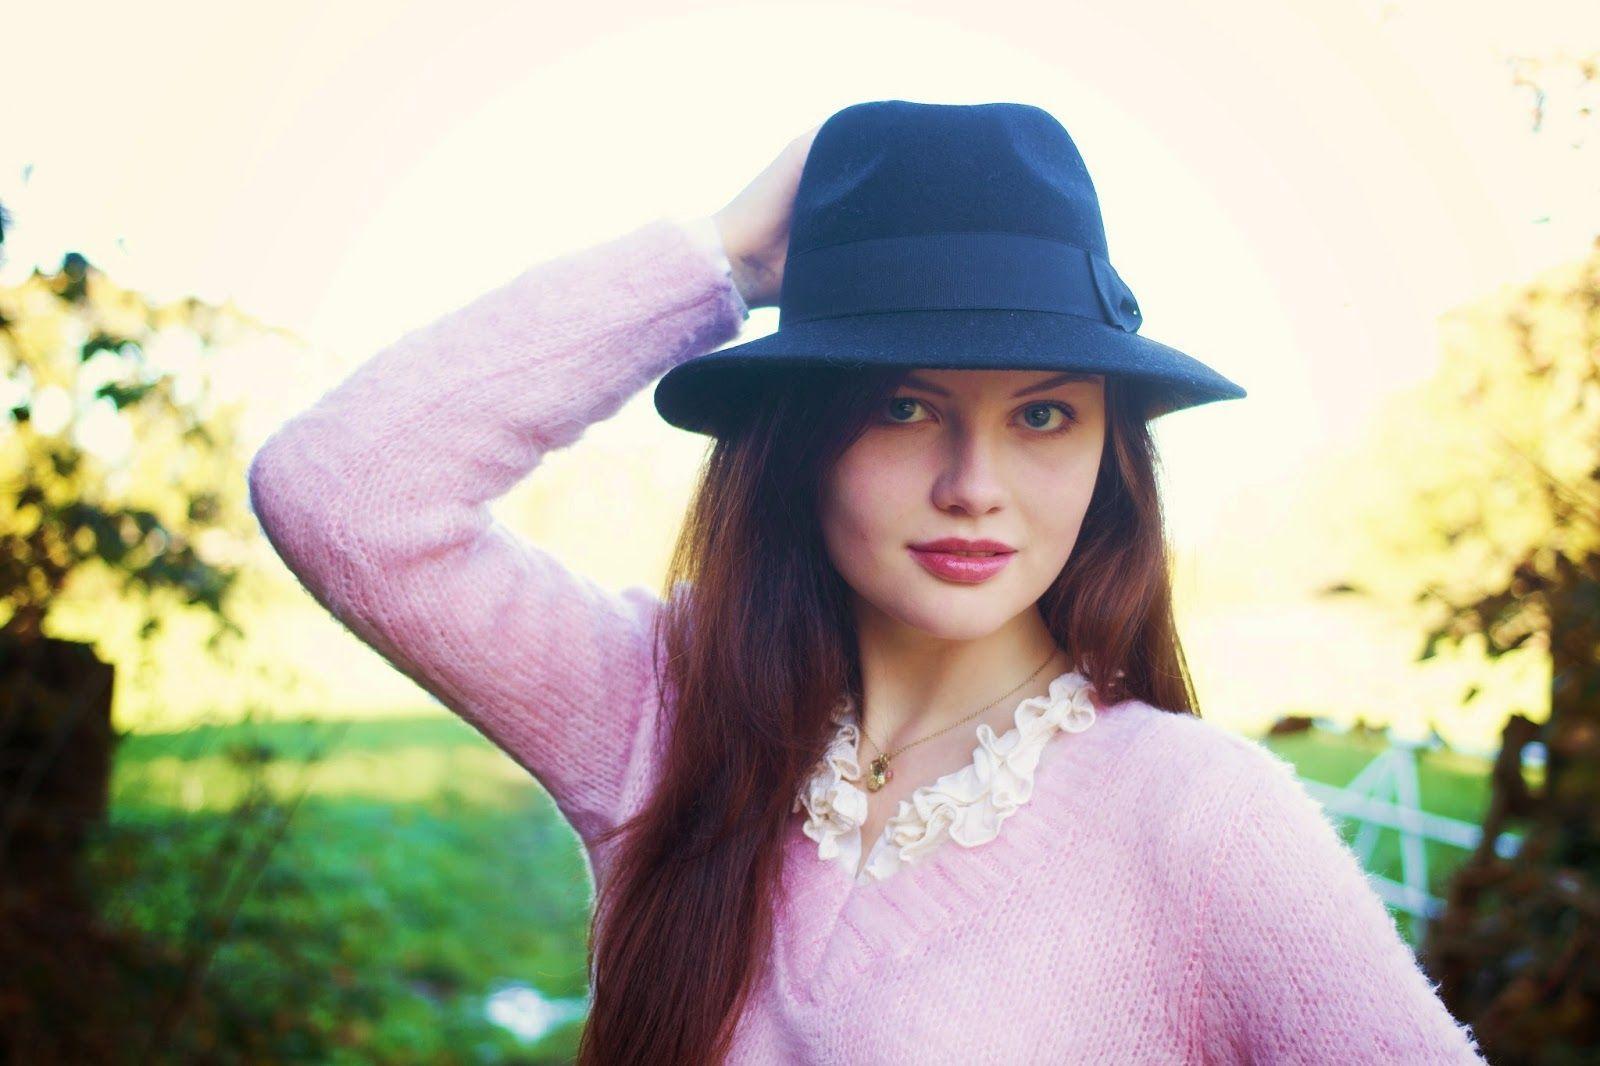 Beautiful Cute Girl Wallpapers Top Free Beautiful Cute Girl Backgrounds Wallpaperaccess